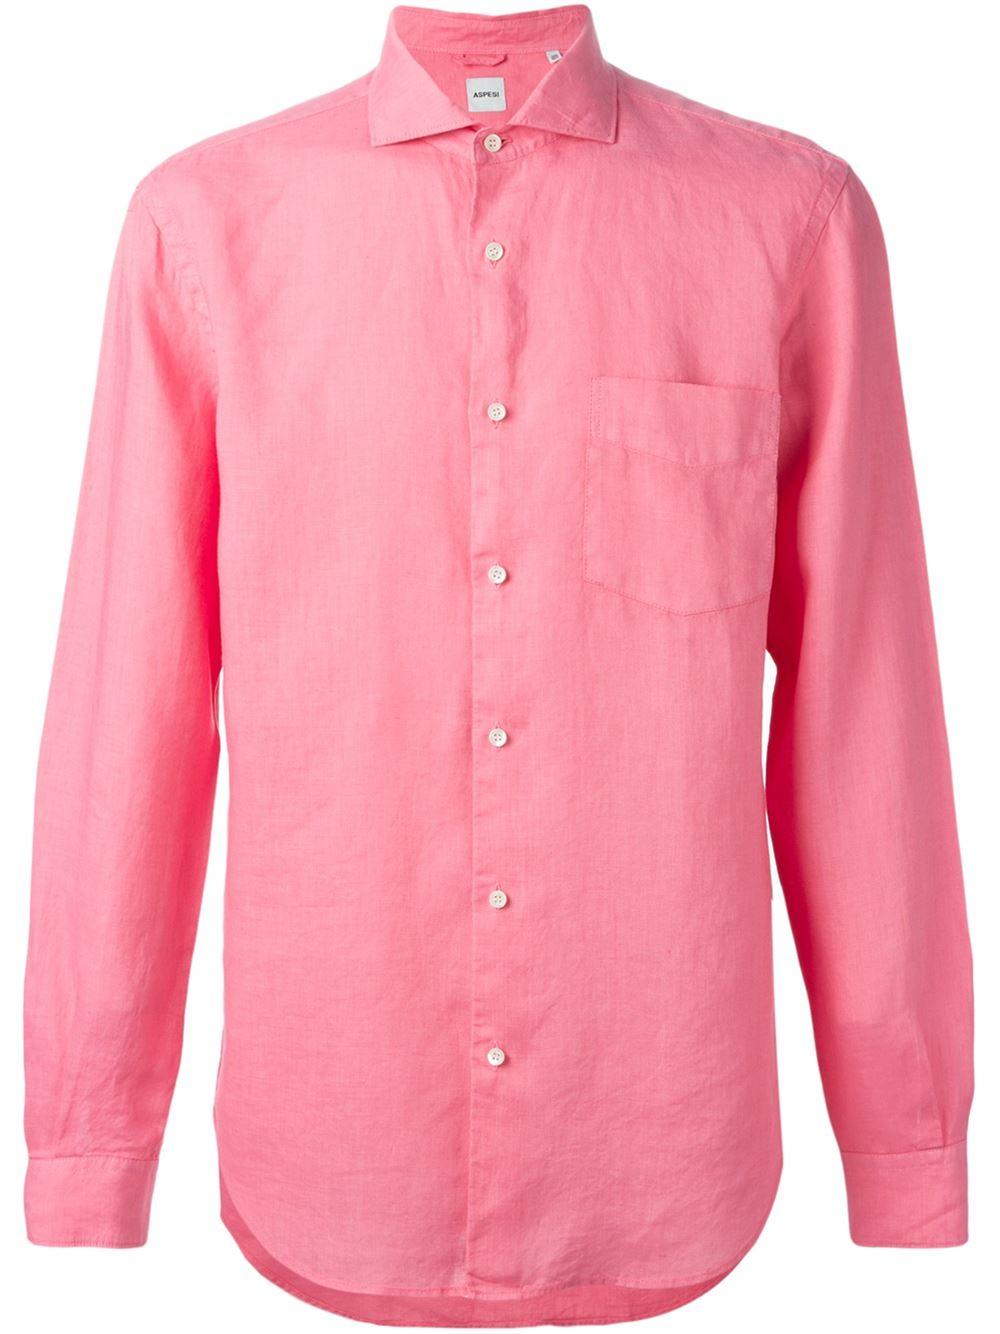 Aspesi spread collar shirt in pink for men pink purple for What is a spread collar shirt